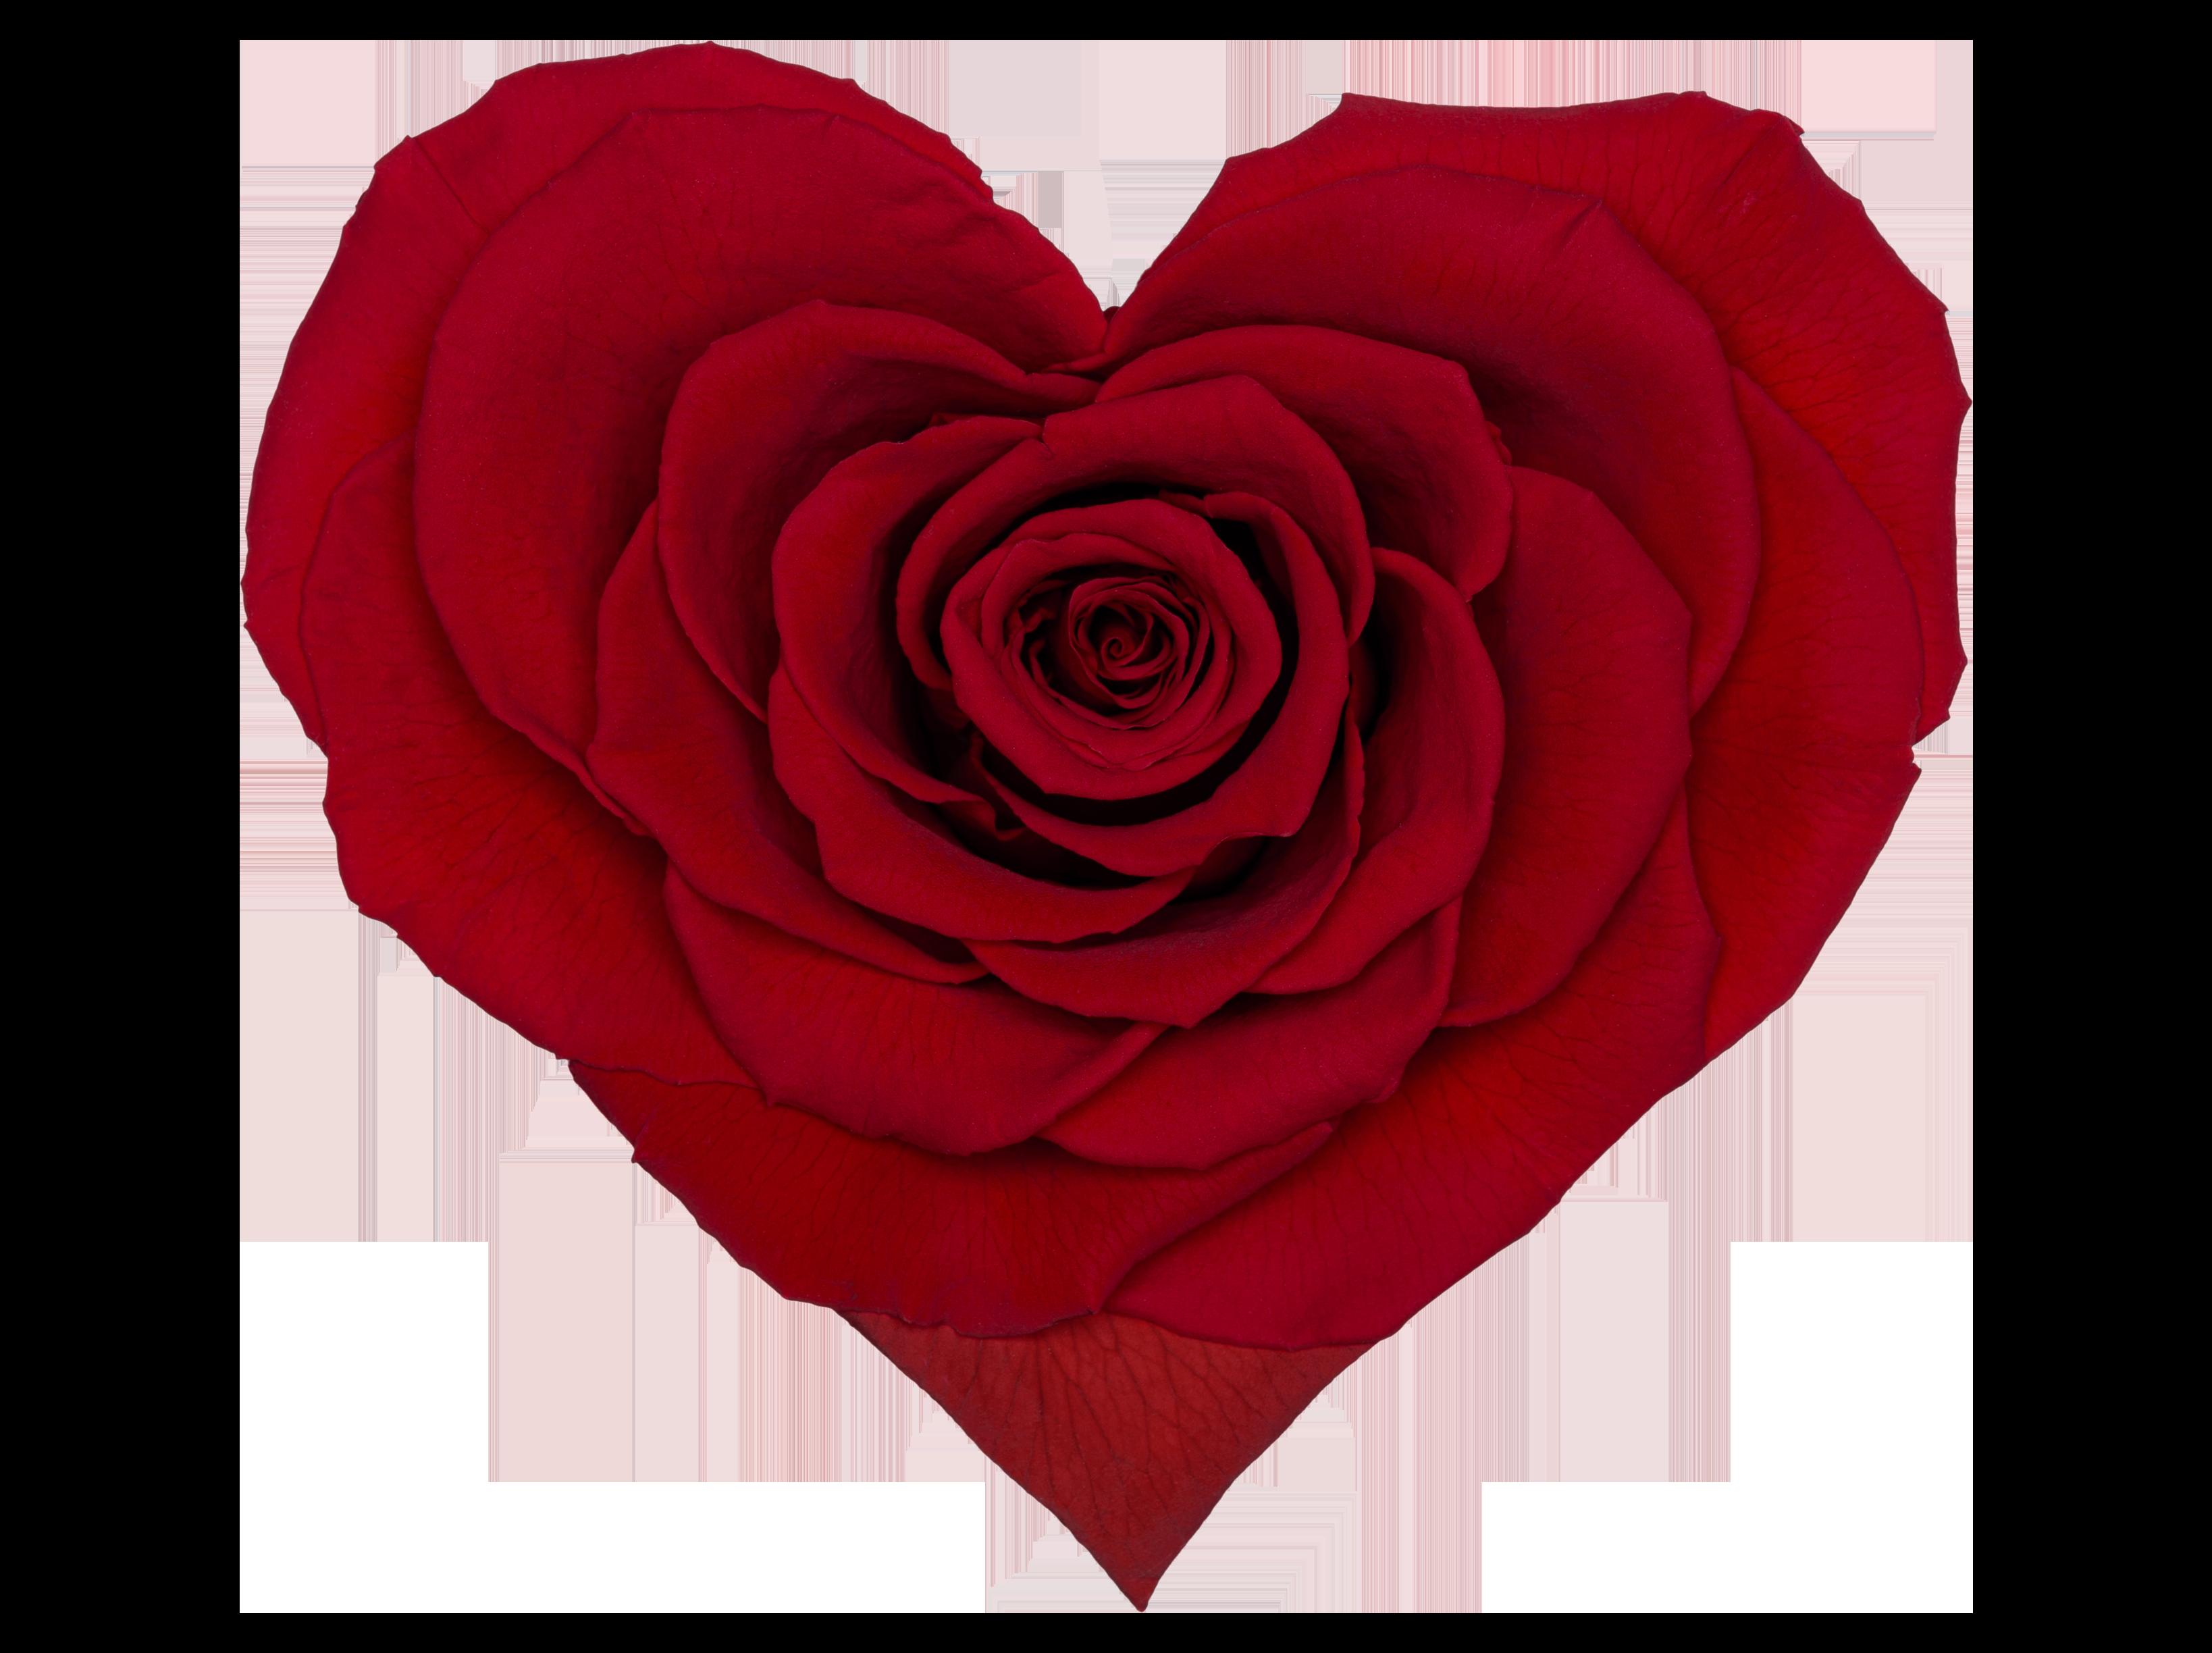 Heart Red 02 Transparente